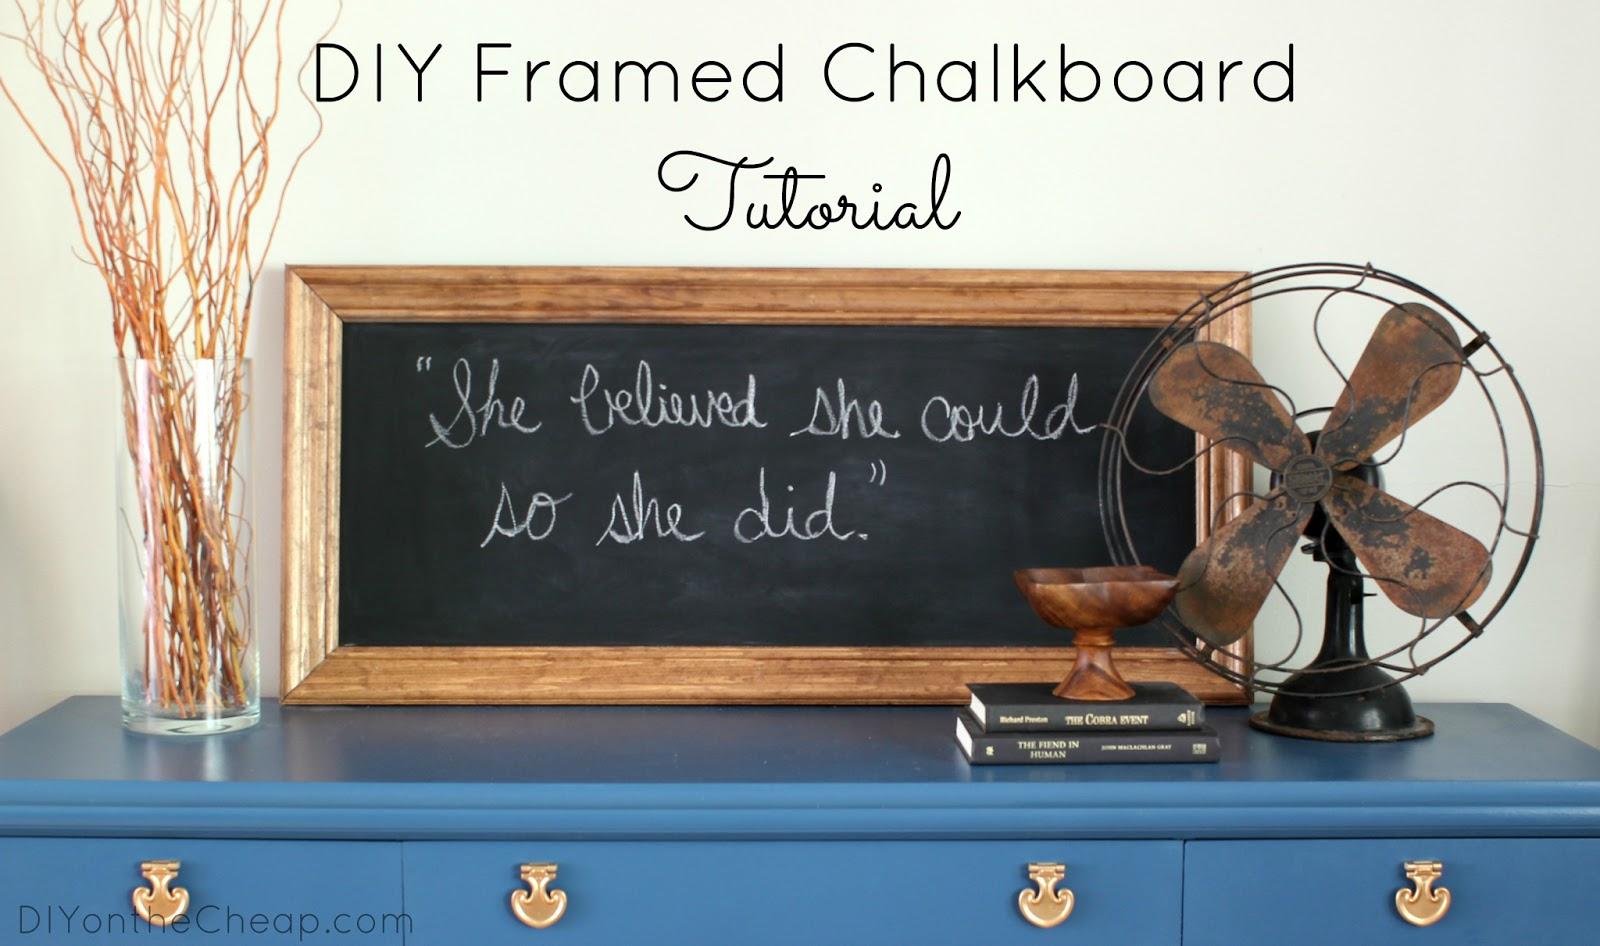 Uncategorized Make Framed Chalkboard diy framed chalkboard tutorial erin spain tutorial